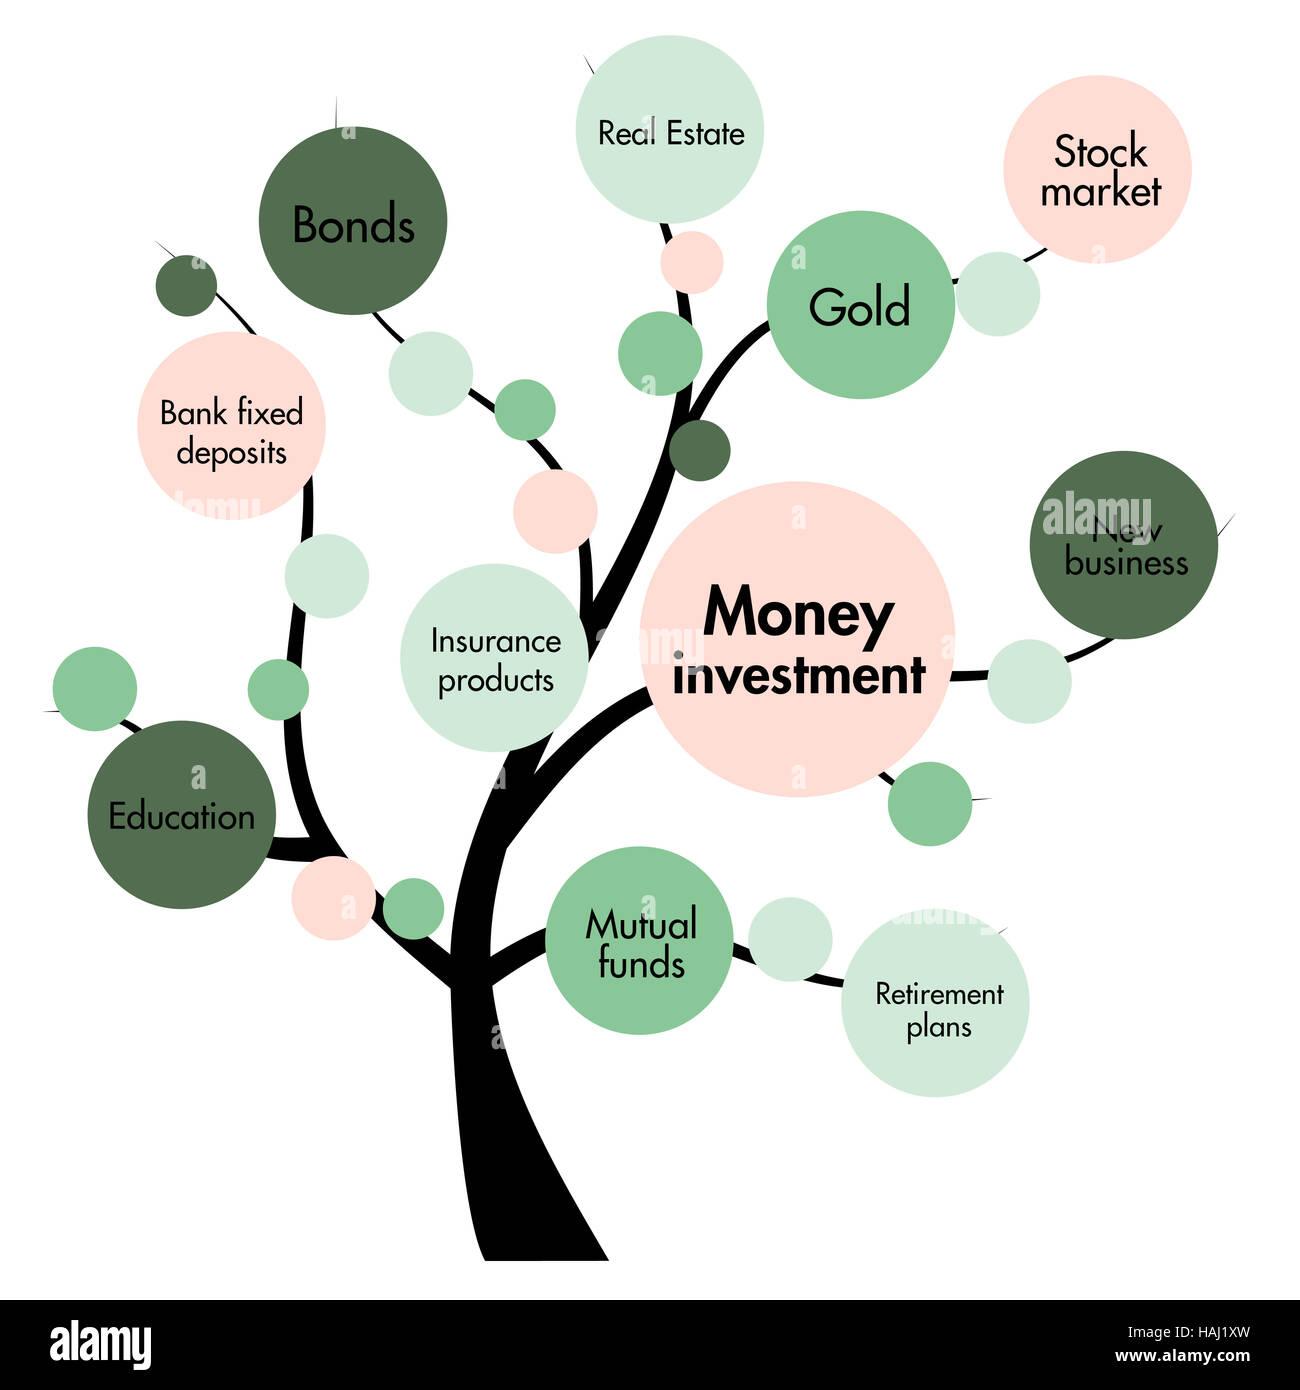 money investment concept tree - Stock Image